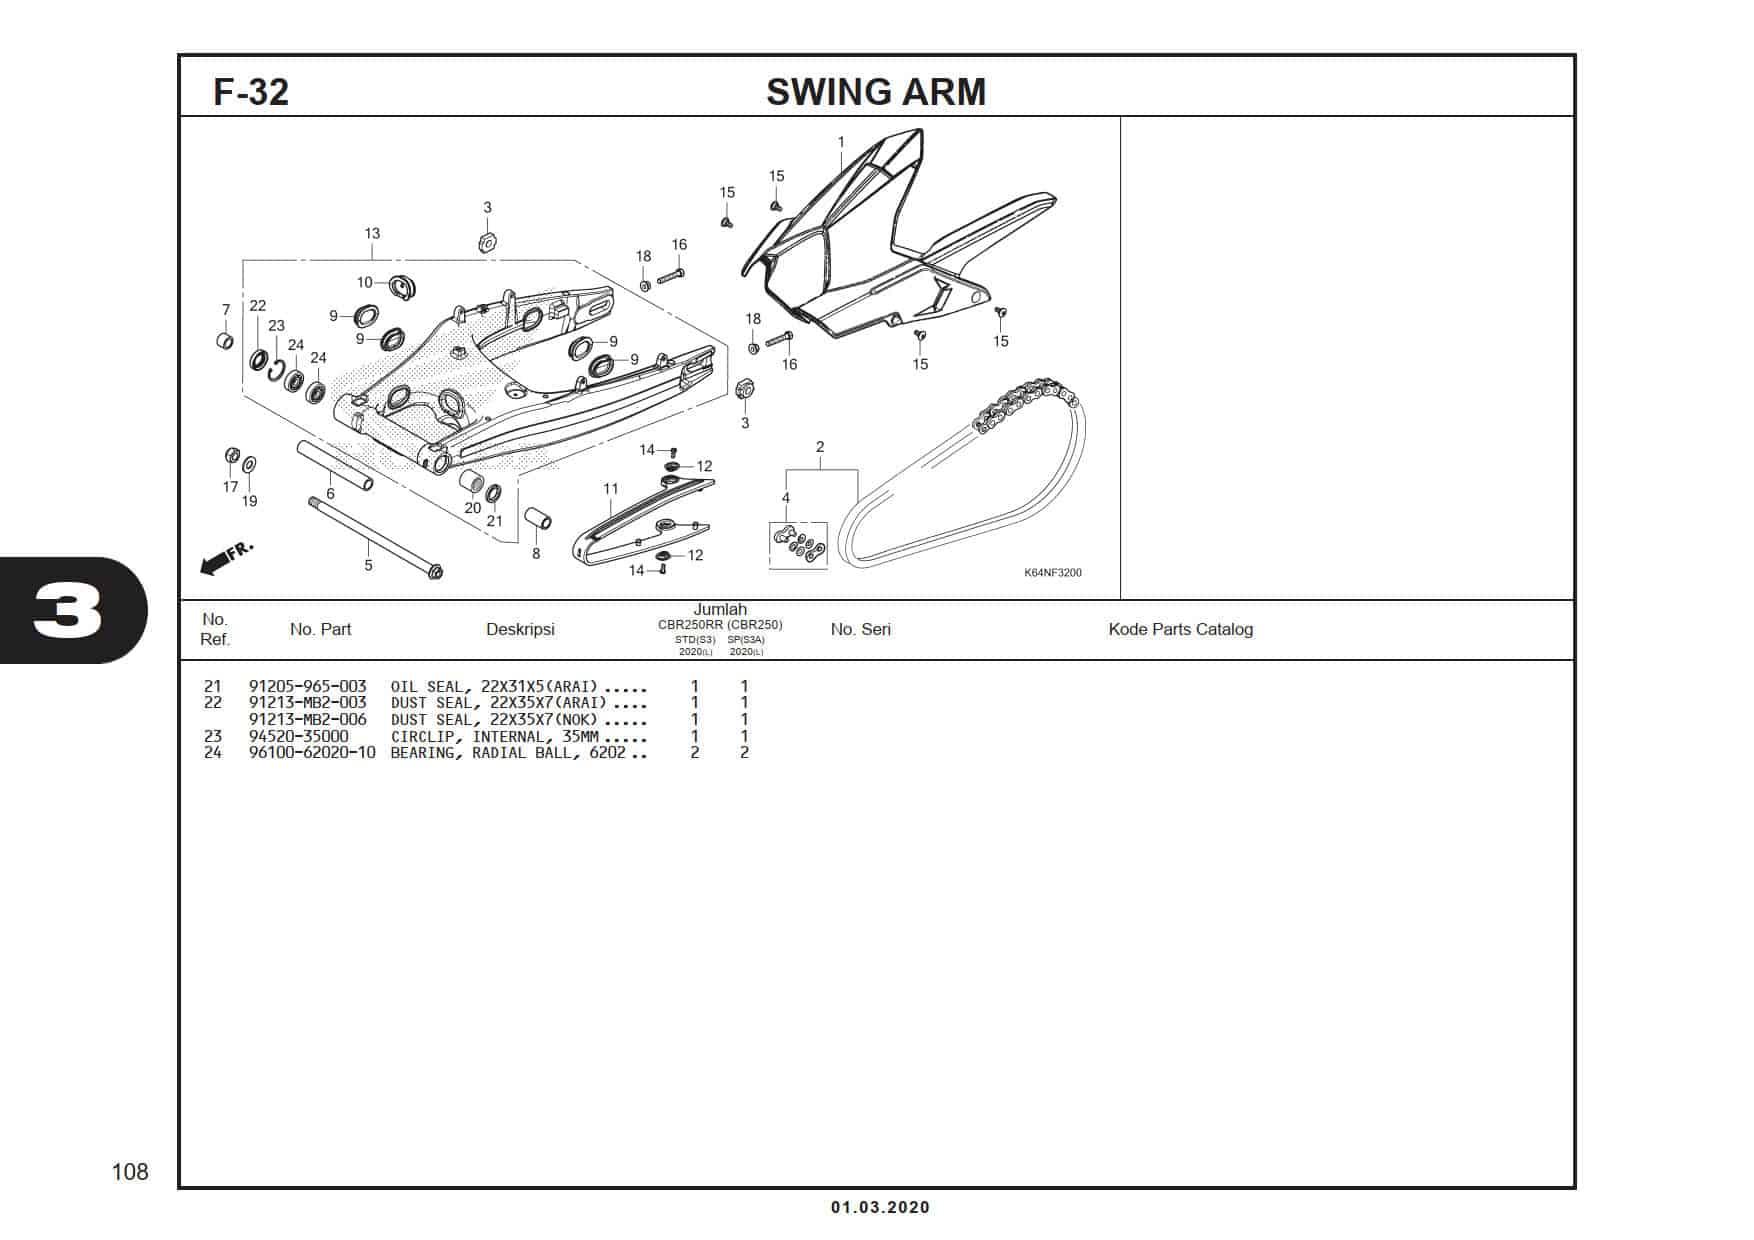 F-32 Swing Arm